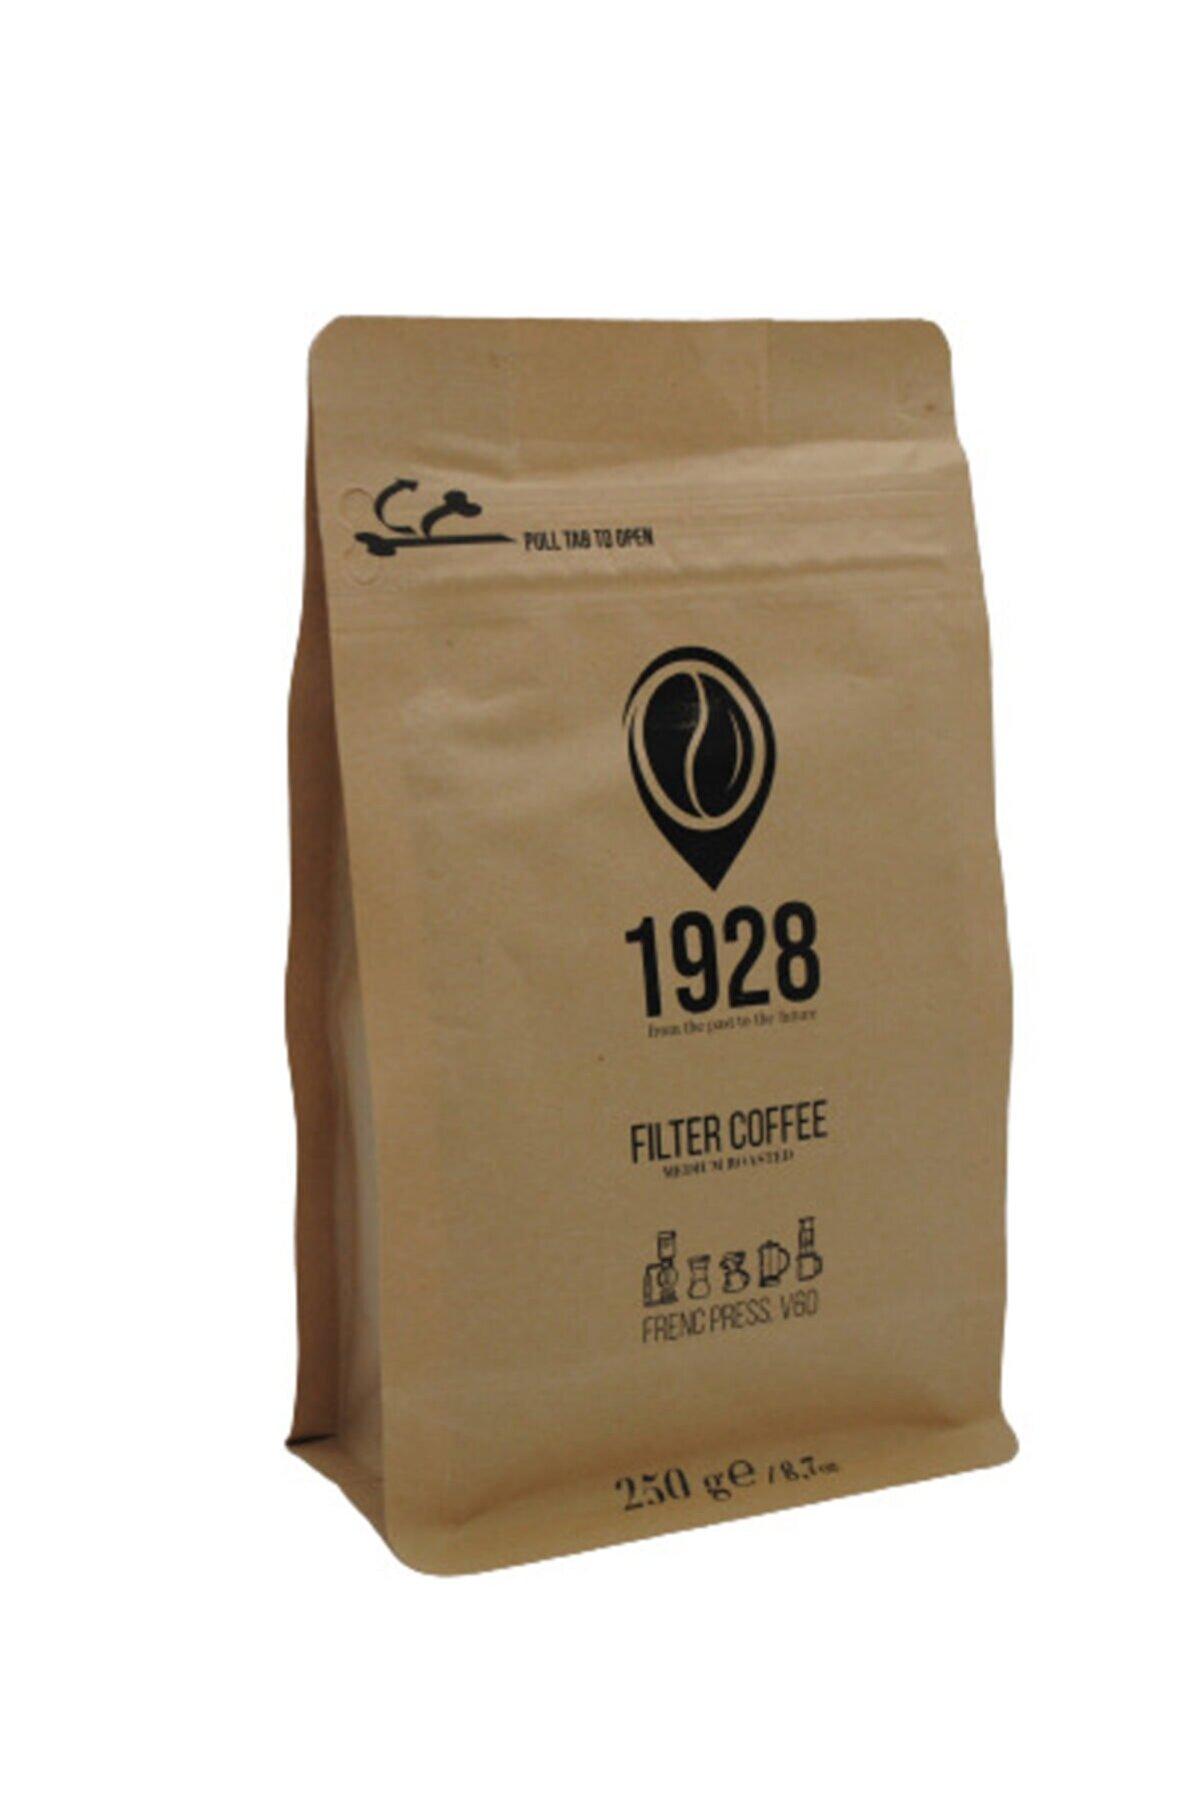 1928 Roasting Fılter Coffee 250 Gr.